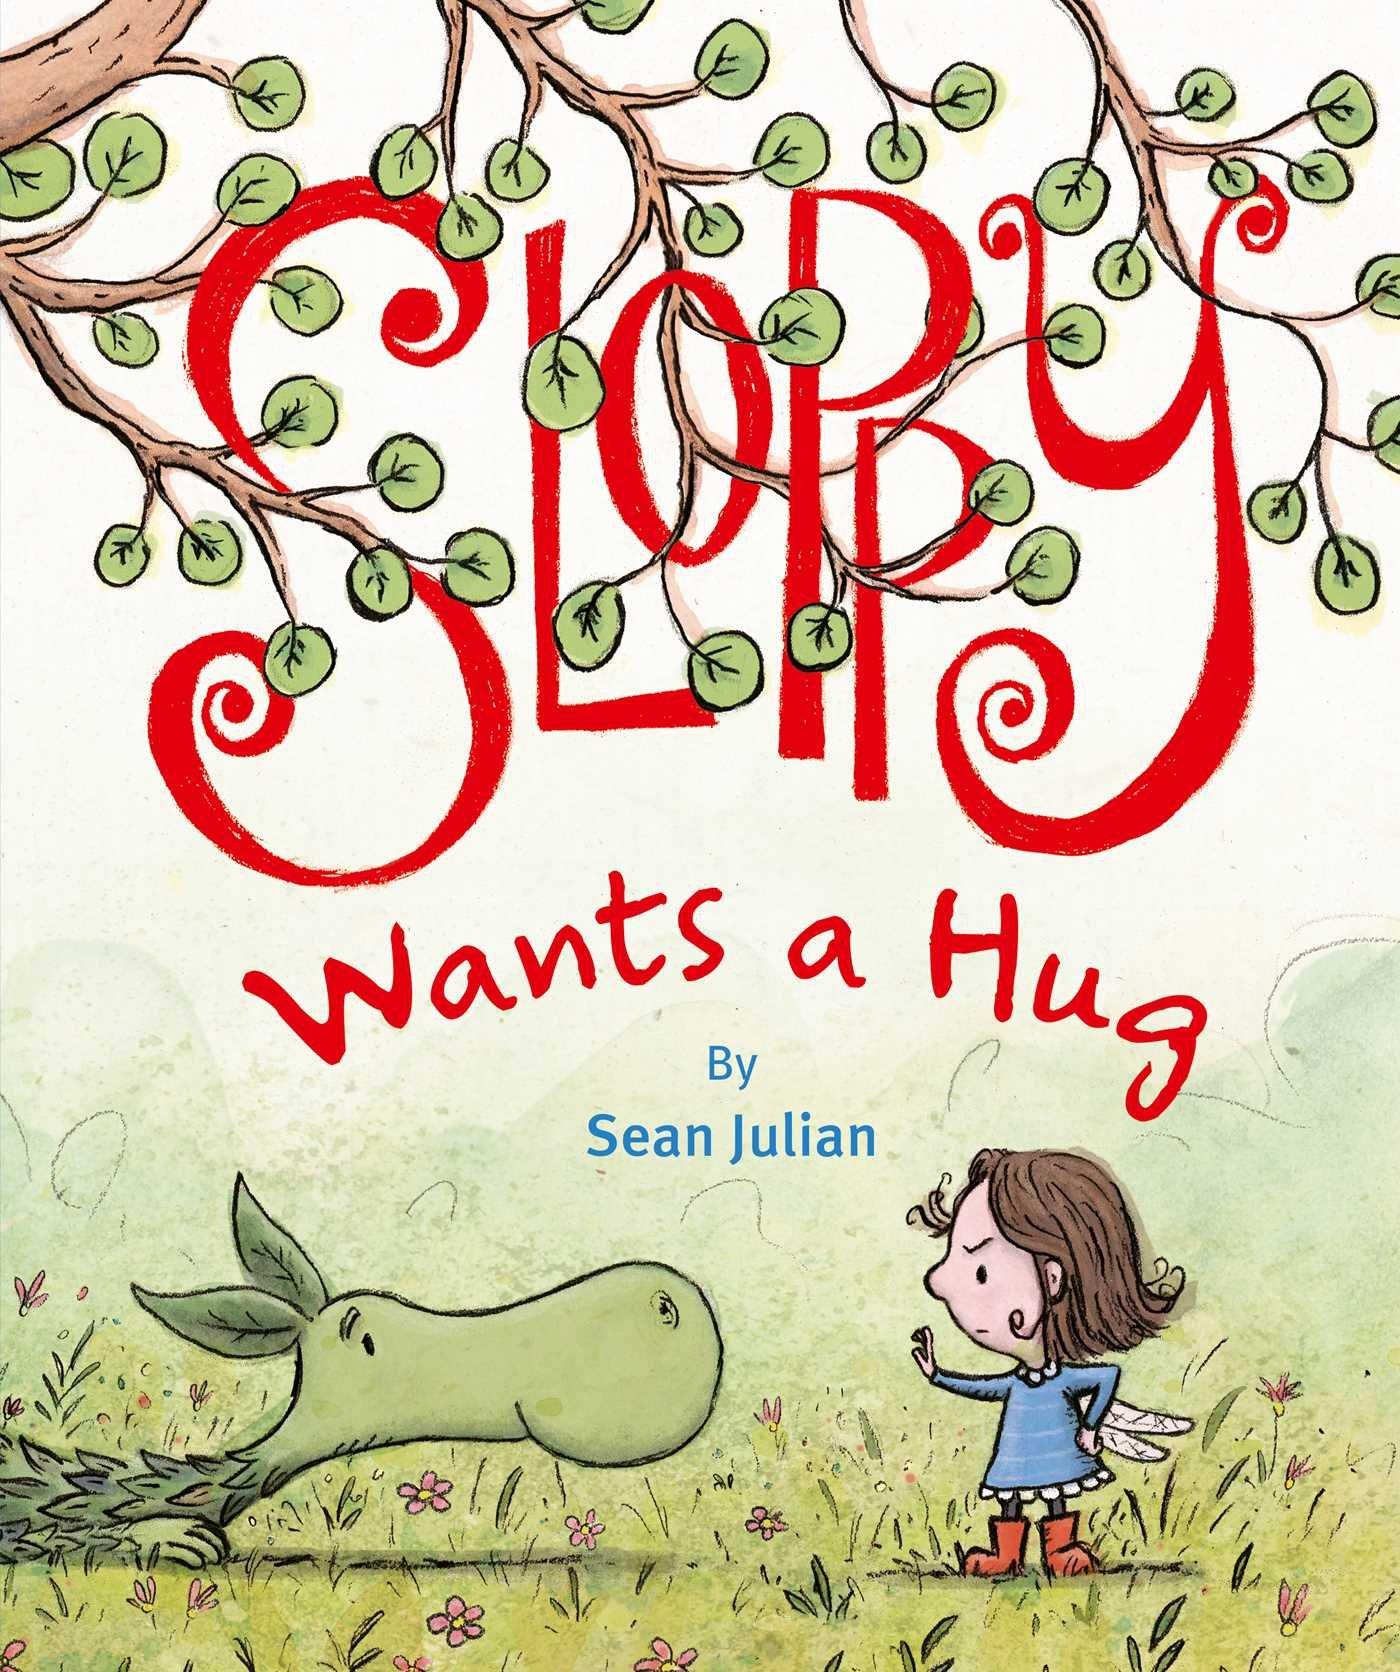 Sloppy Wants a Hug: Sean Julian: 9780735842731: Amazon.com: Books